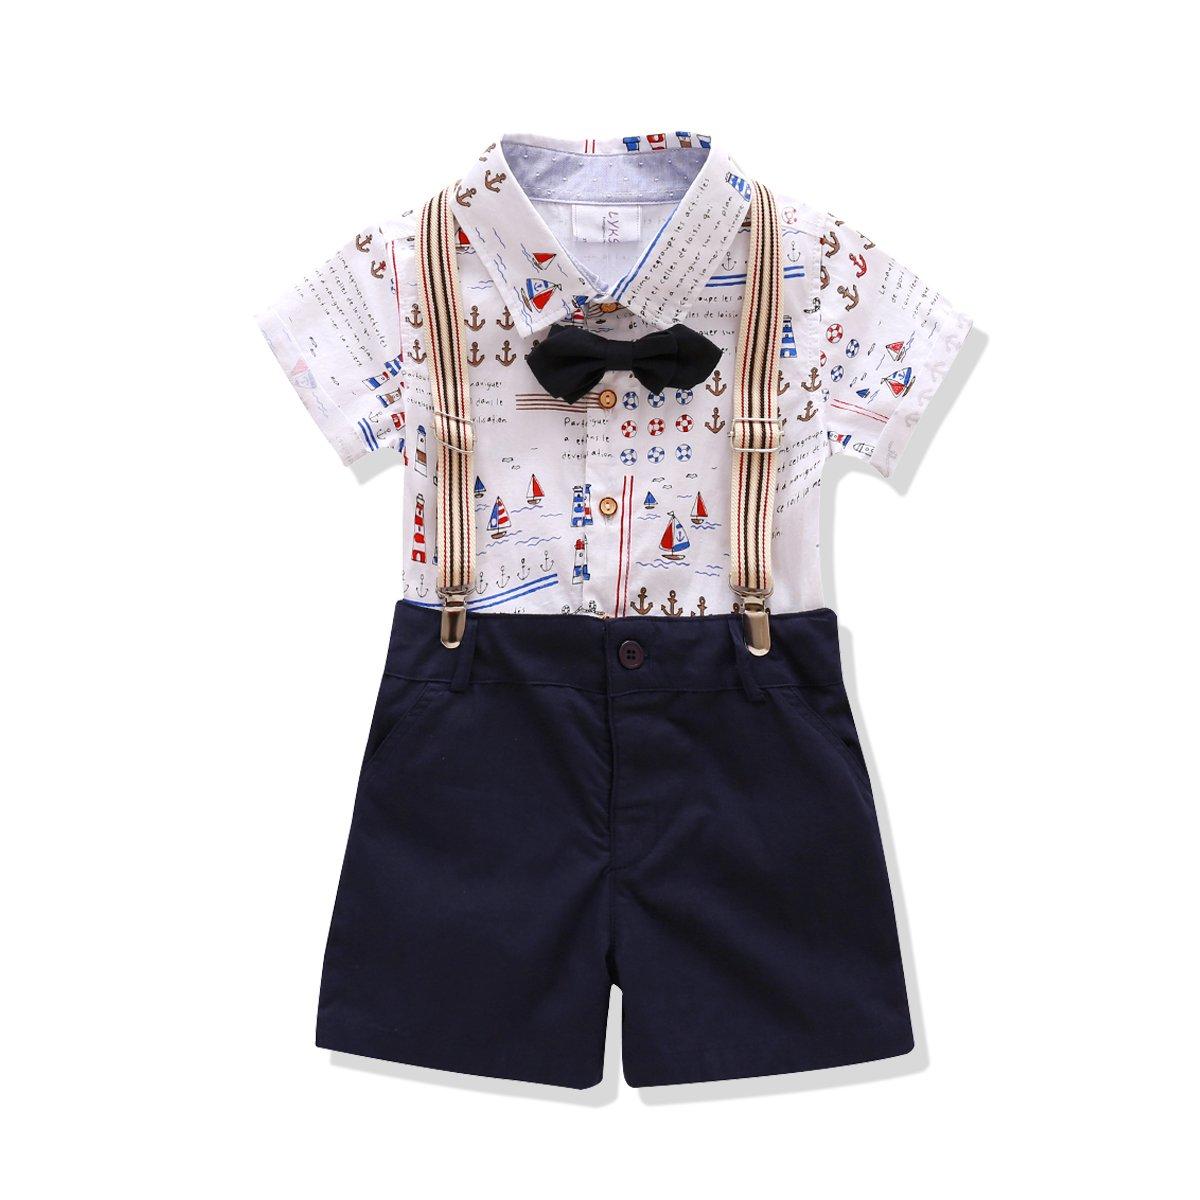 little boys Outfit,Bowtie Gentleman Suspender Clothing Set (6T)